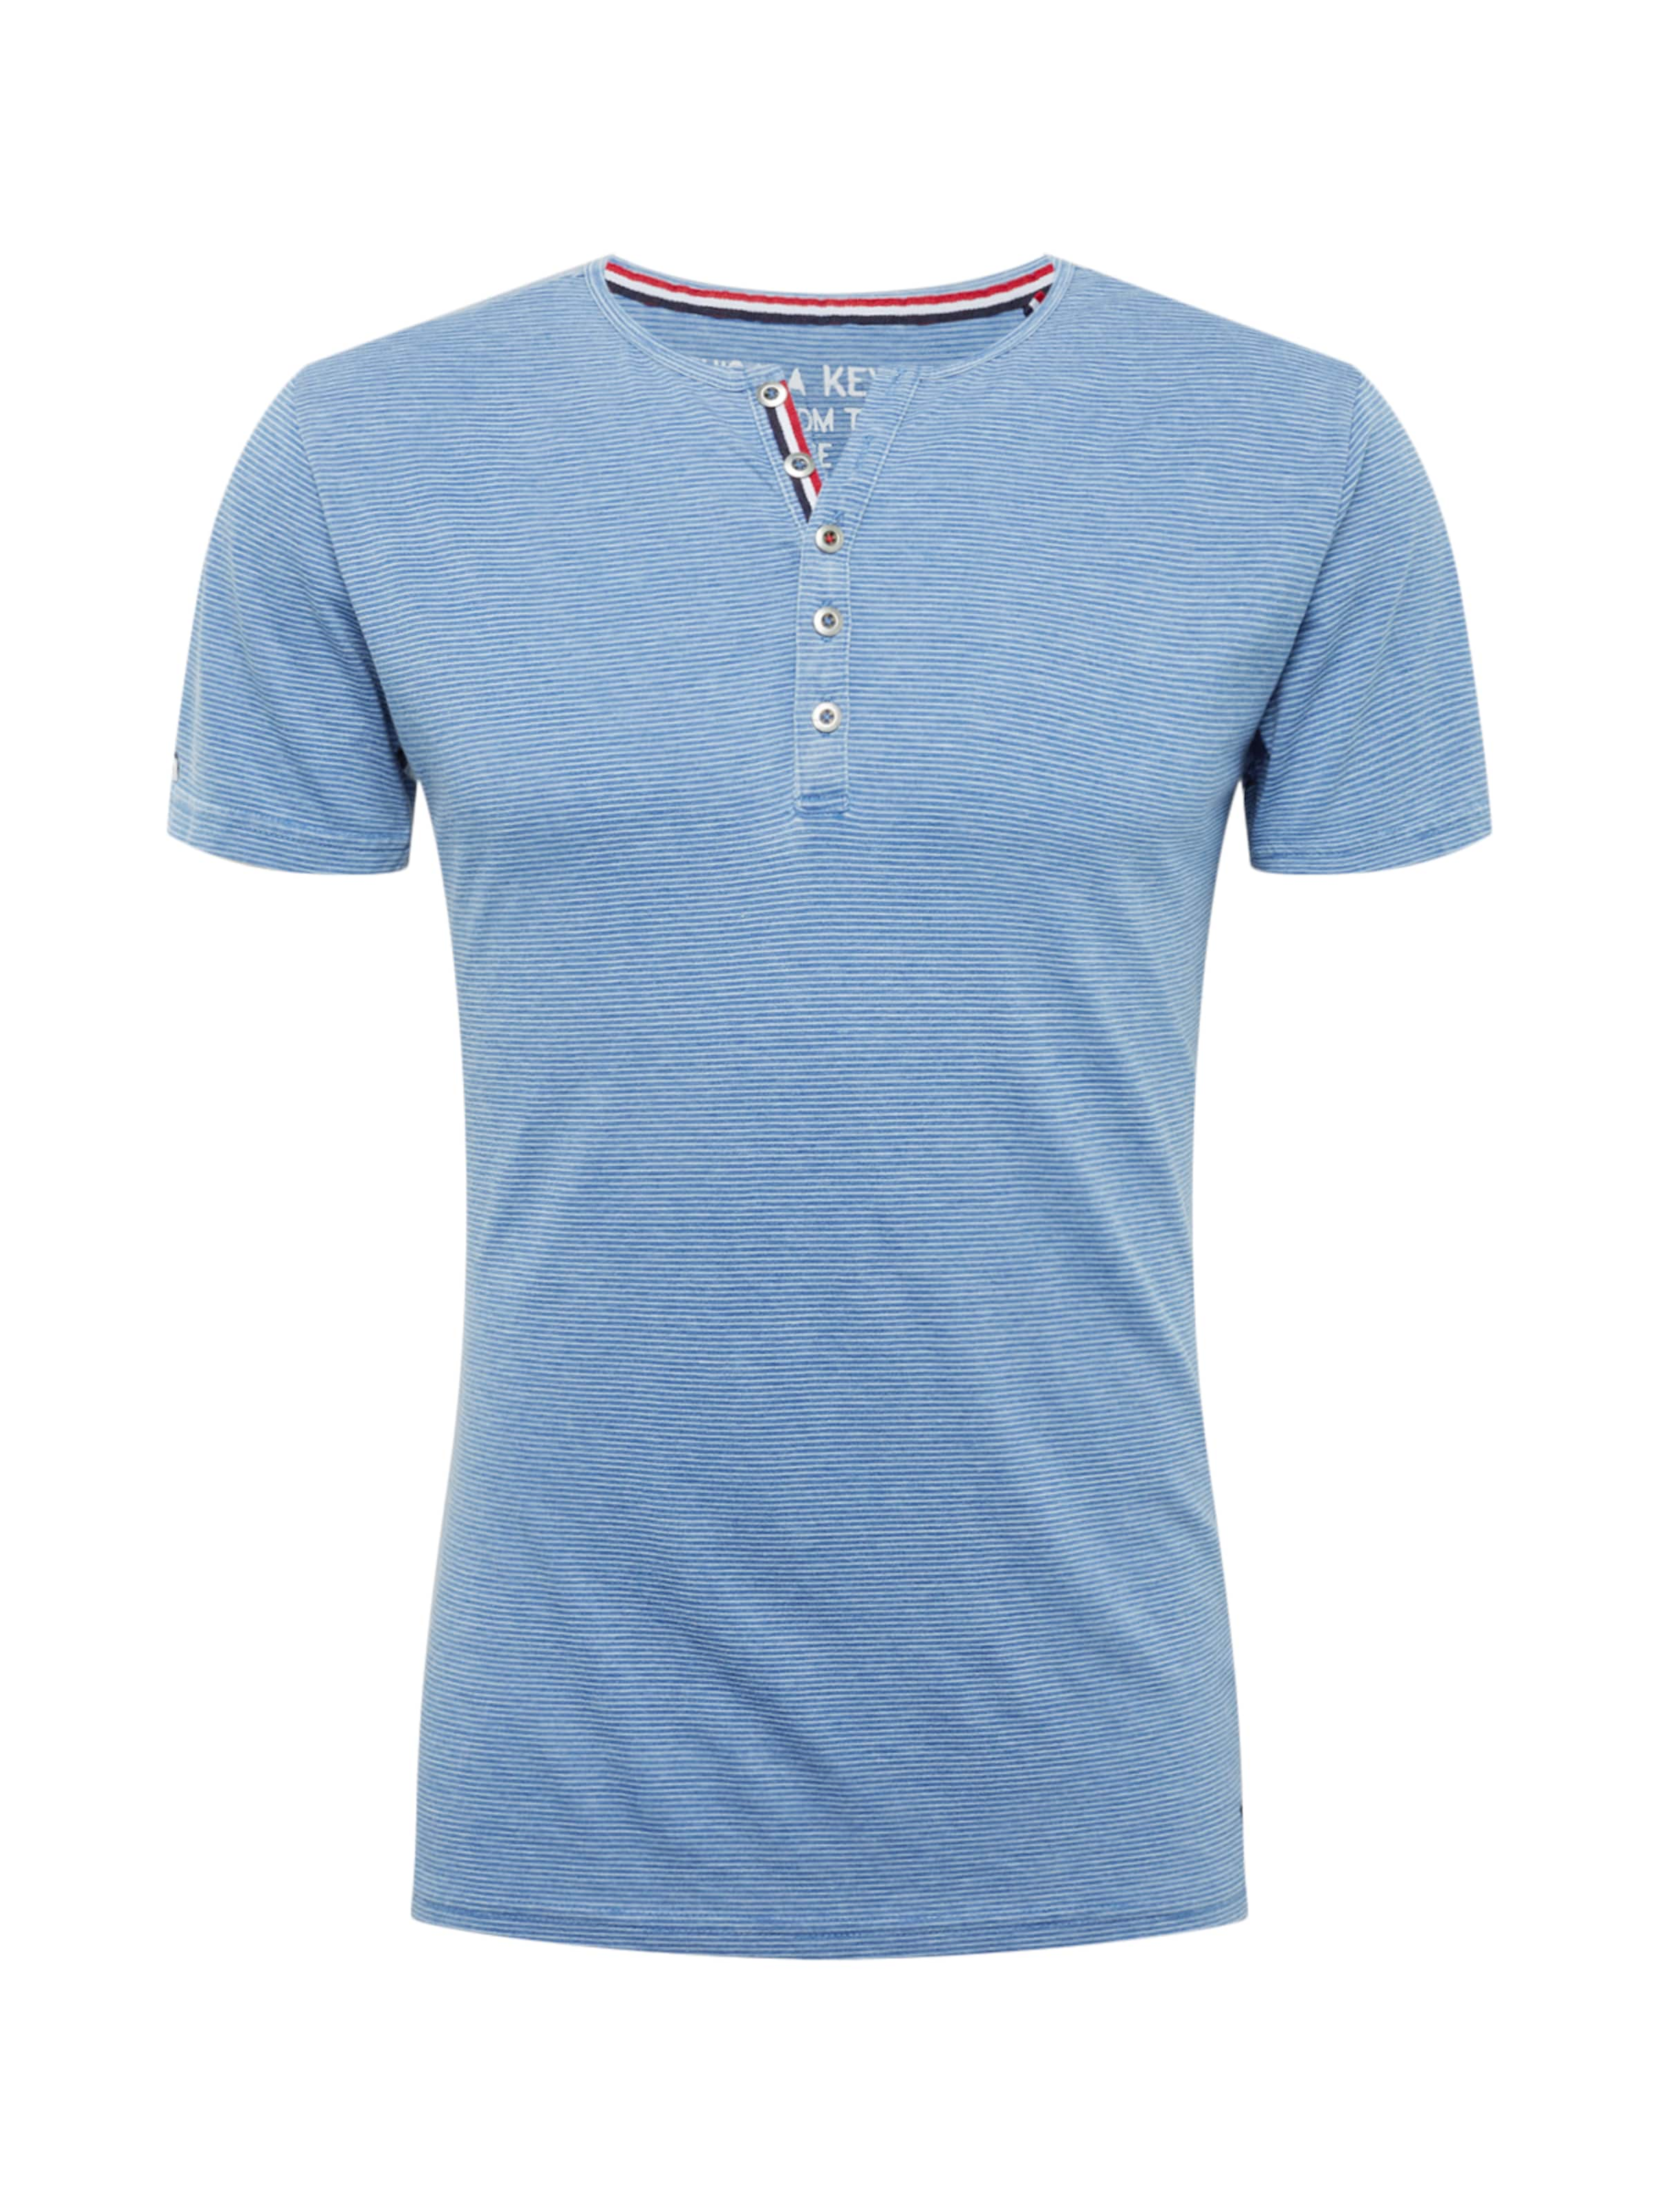 T 'mt shirt En Key Dieter' Largo FoncéBlanc Bleu hxCsrotQdB